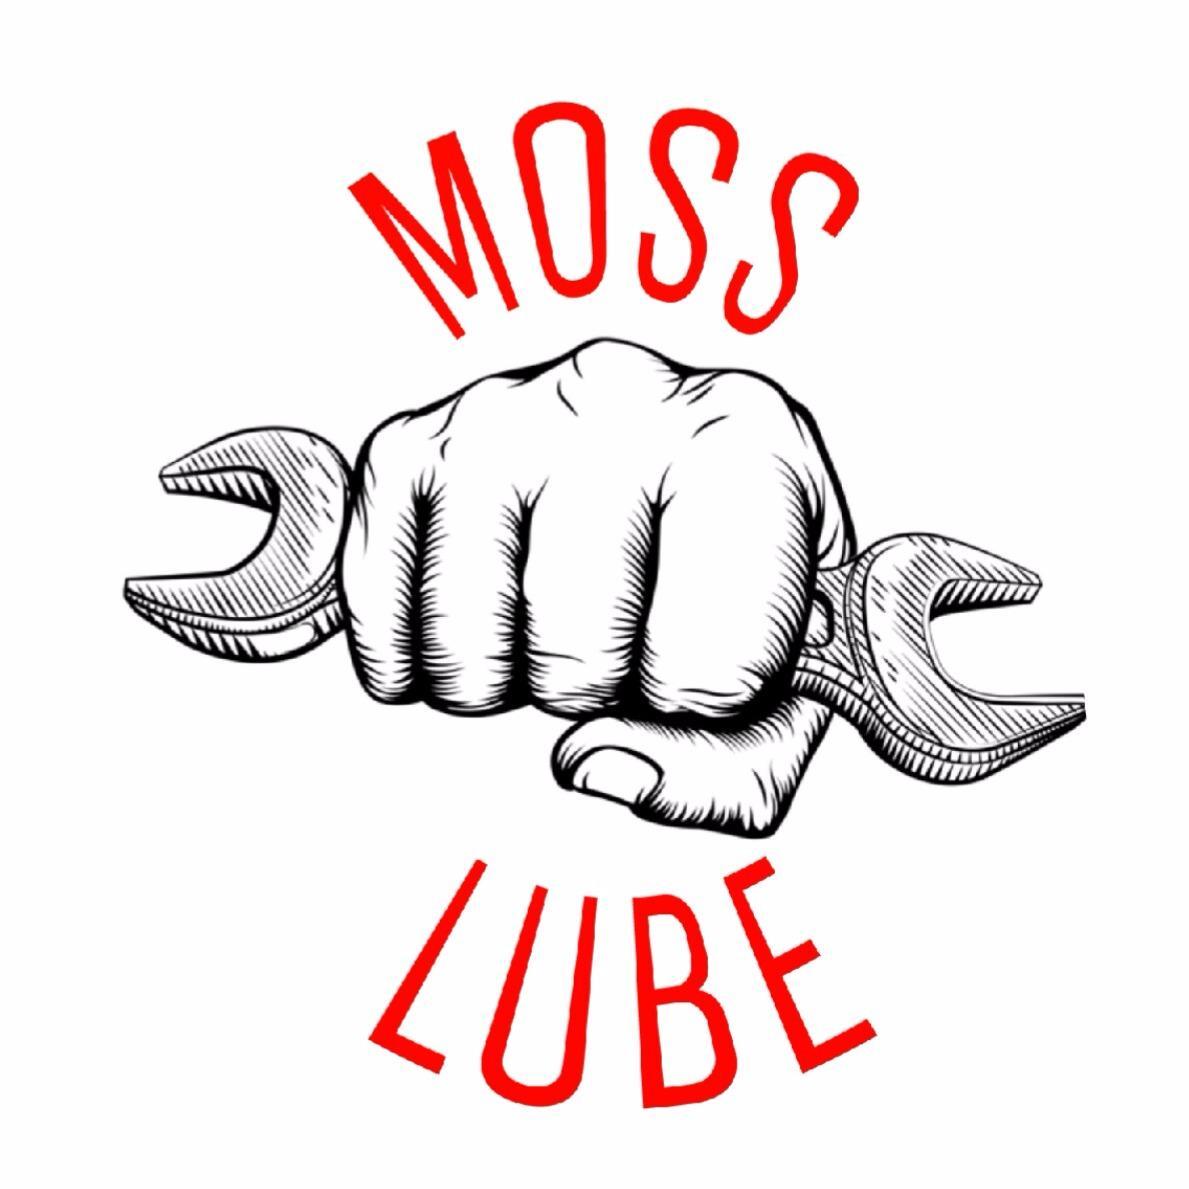 Moss Lube